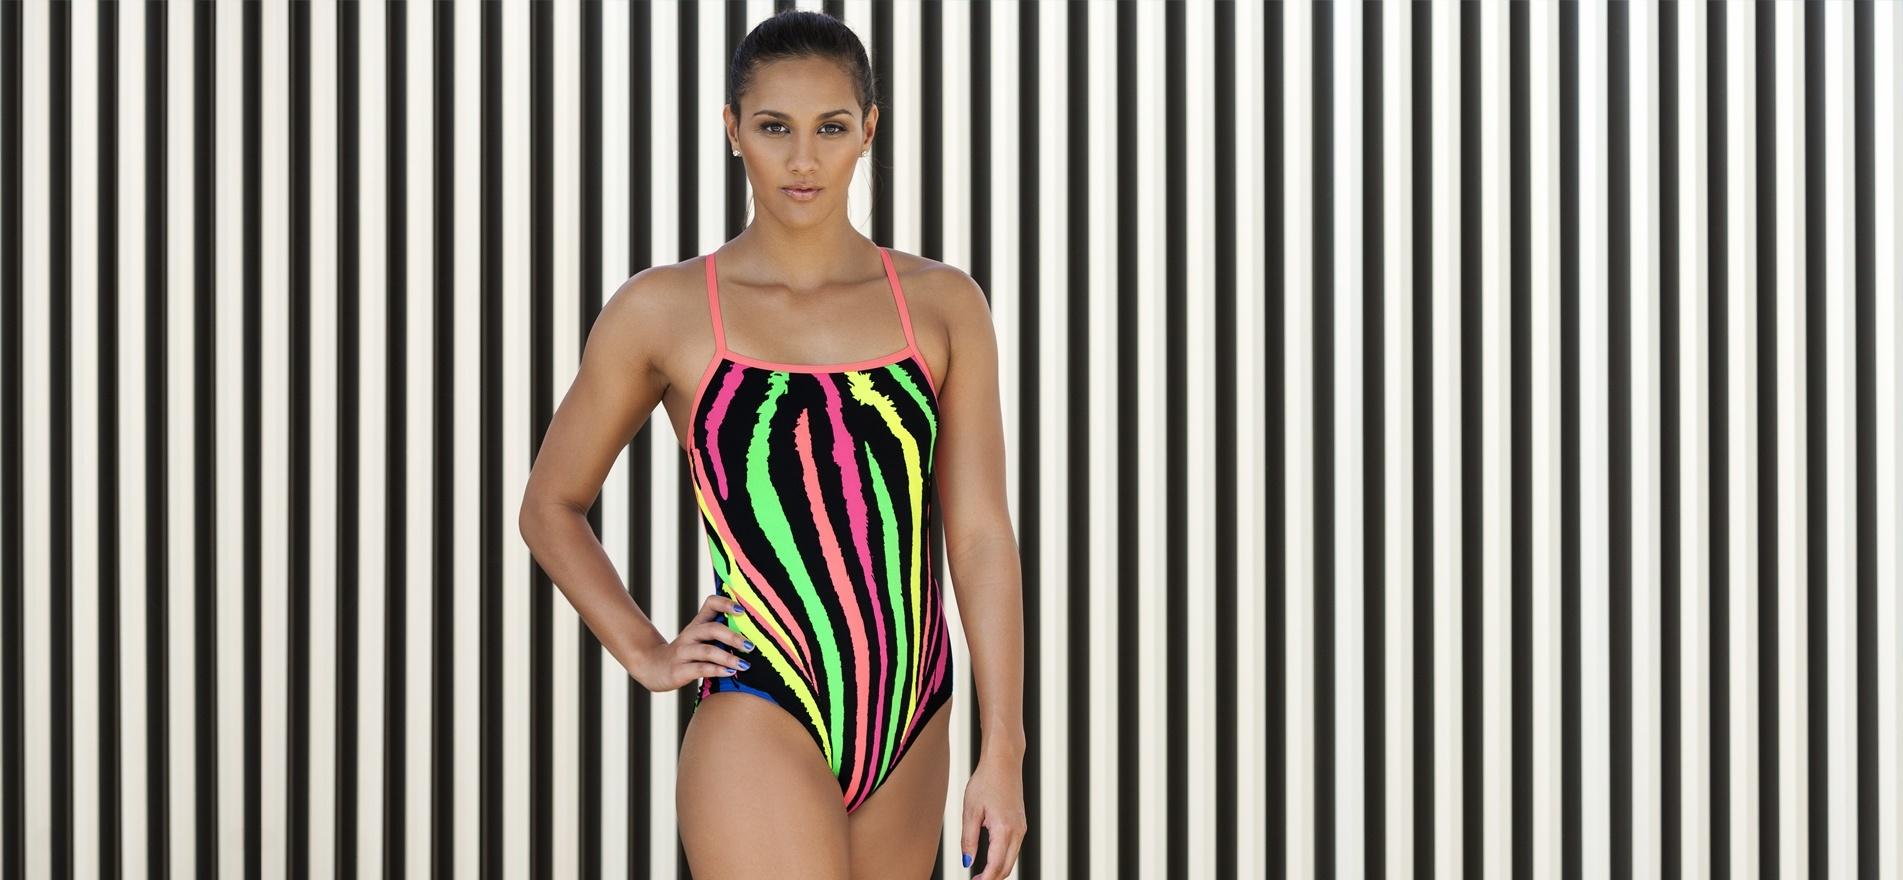 7f6fe9cd357 Funkita Giveaway! Pick Your Favorite Print, Win With The New Funkita  Swimwear Launch